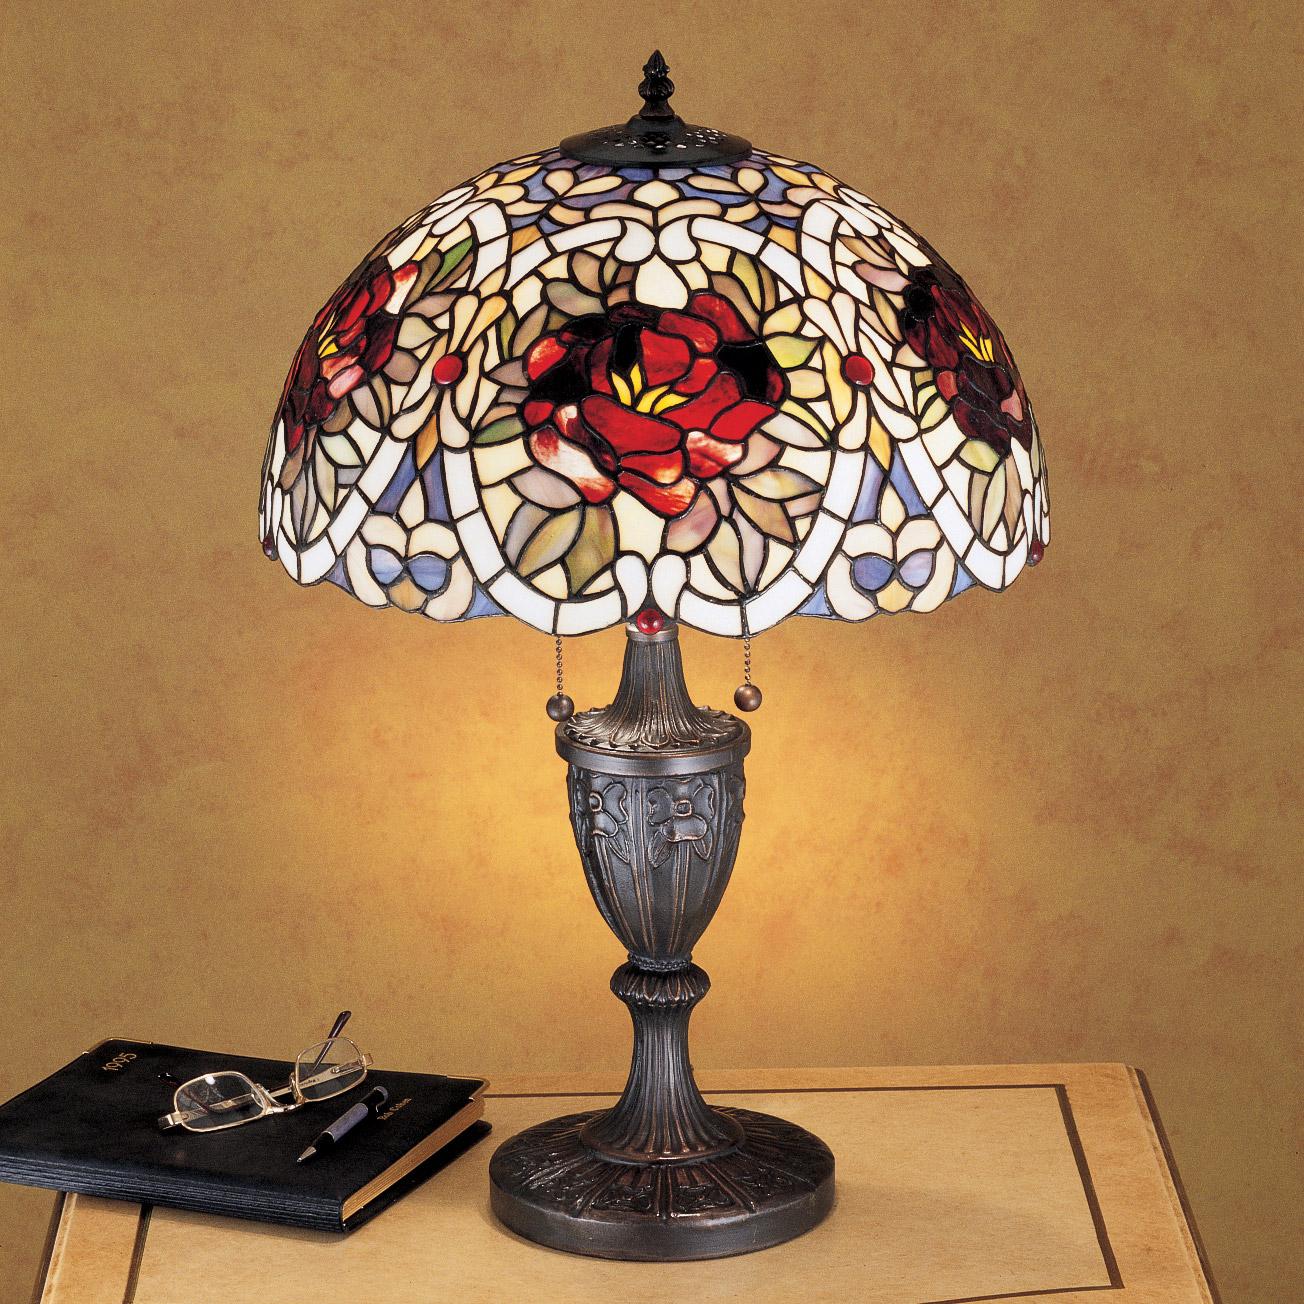 Meyda 26674 Tiffany Renaissance Rose Table Lamp